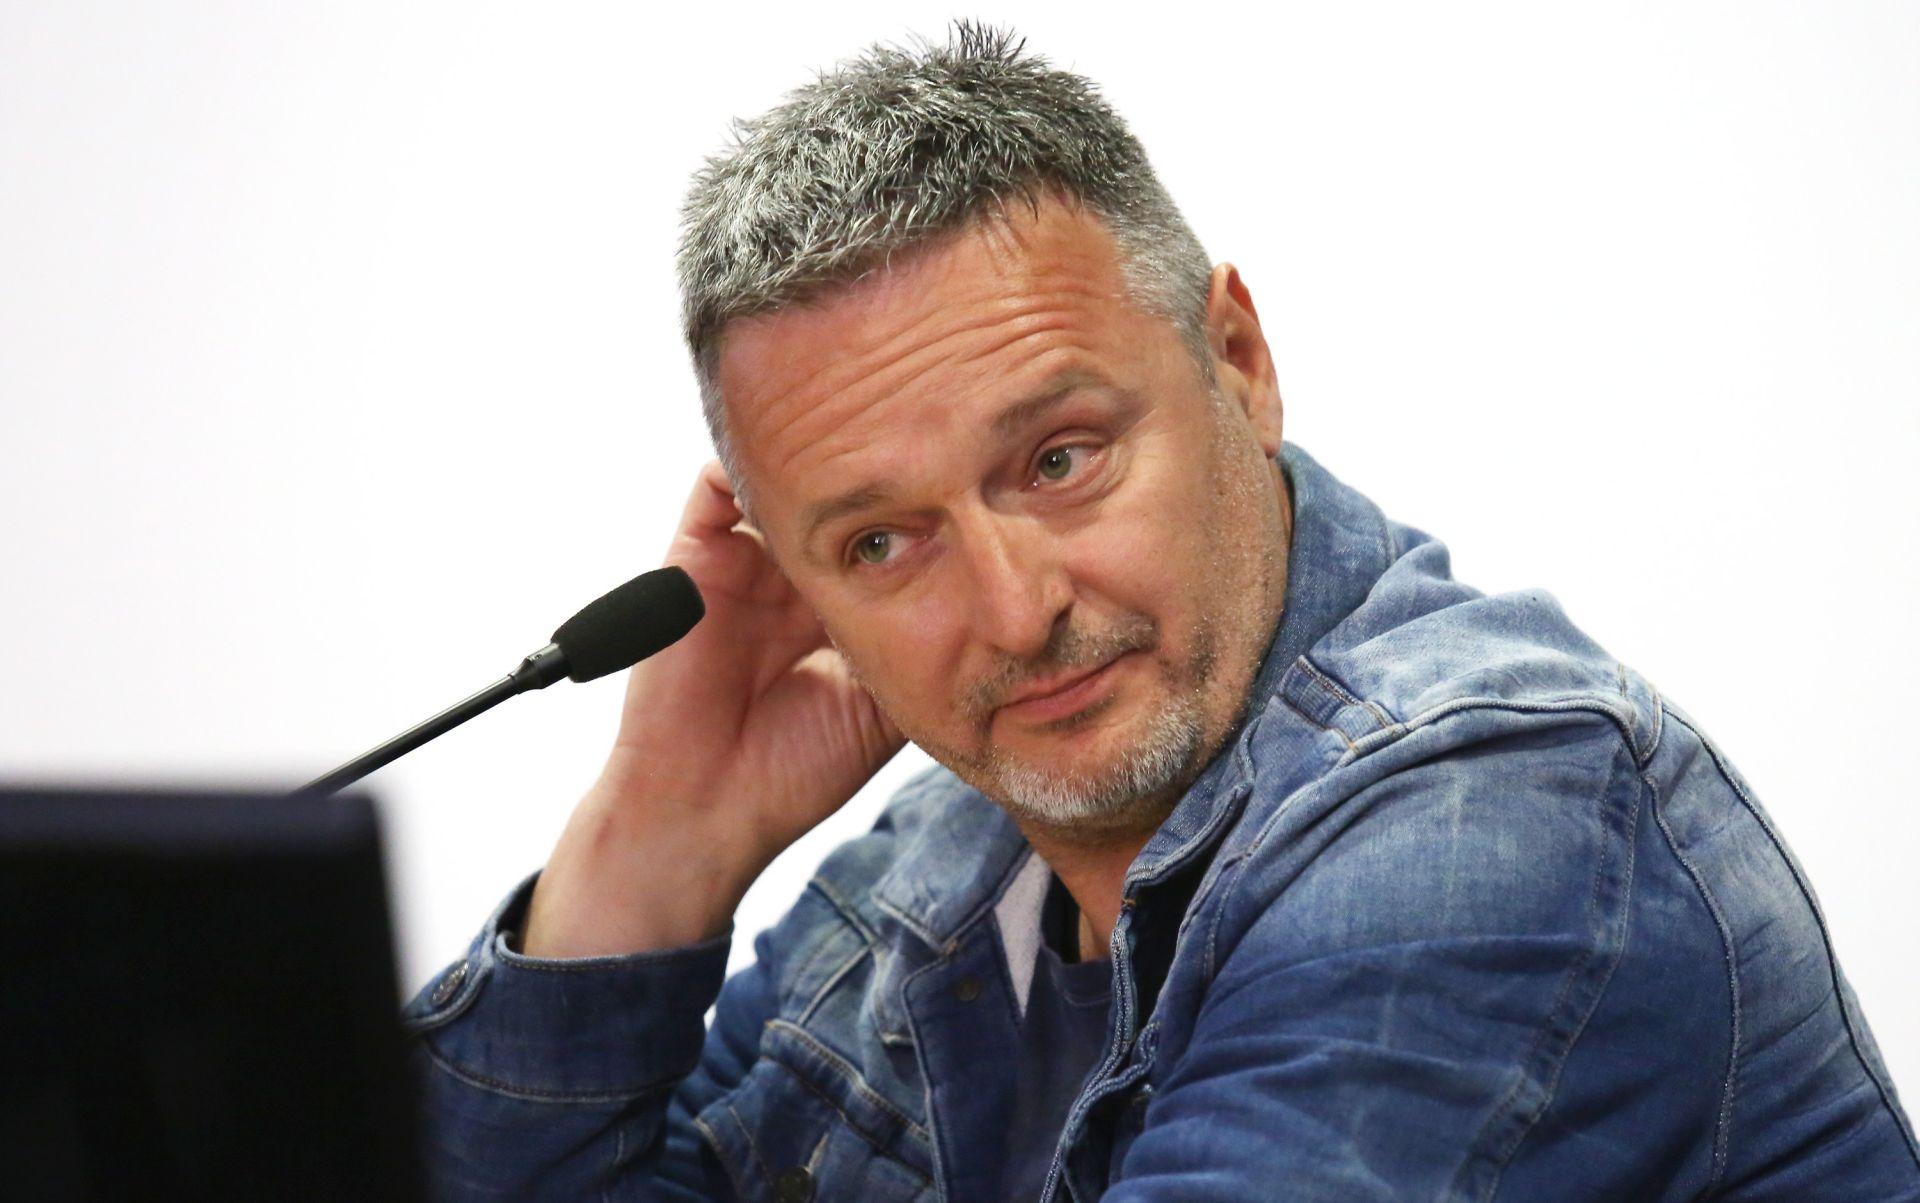 STIGLA POTVRDA Zabranjen koncert Marka Perkovića Thompsona u Švicarskoj